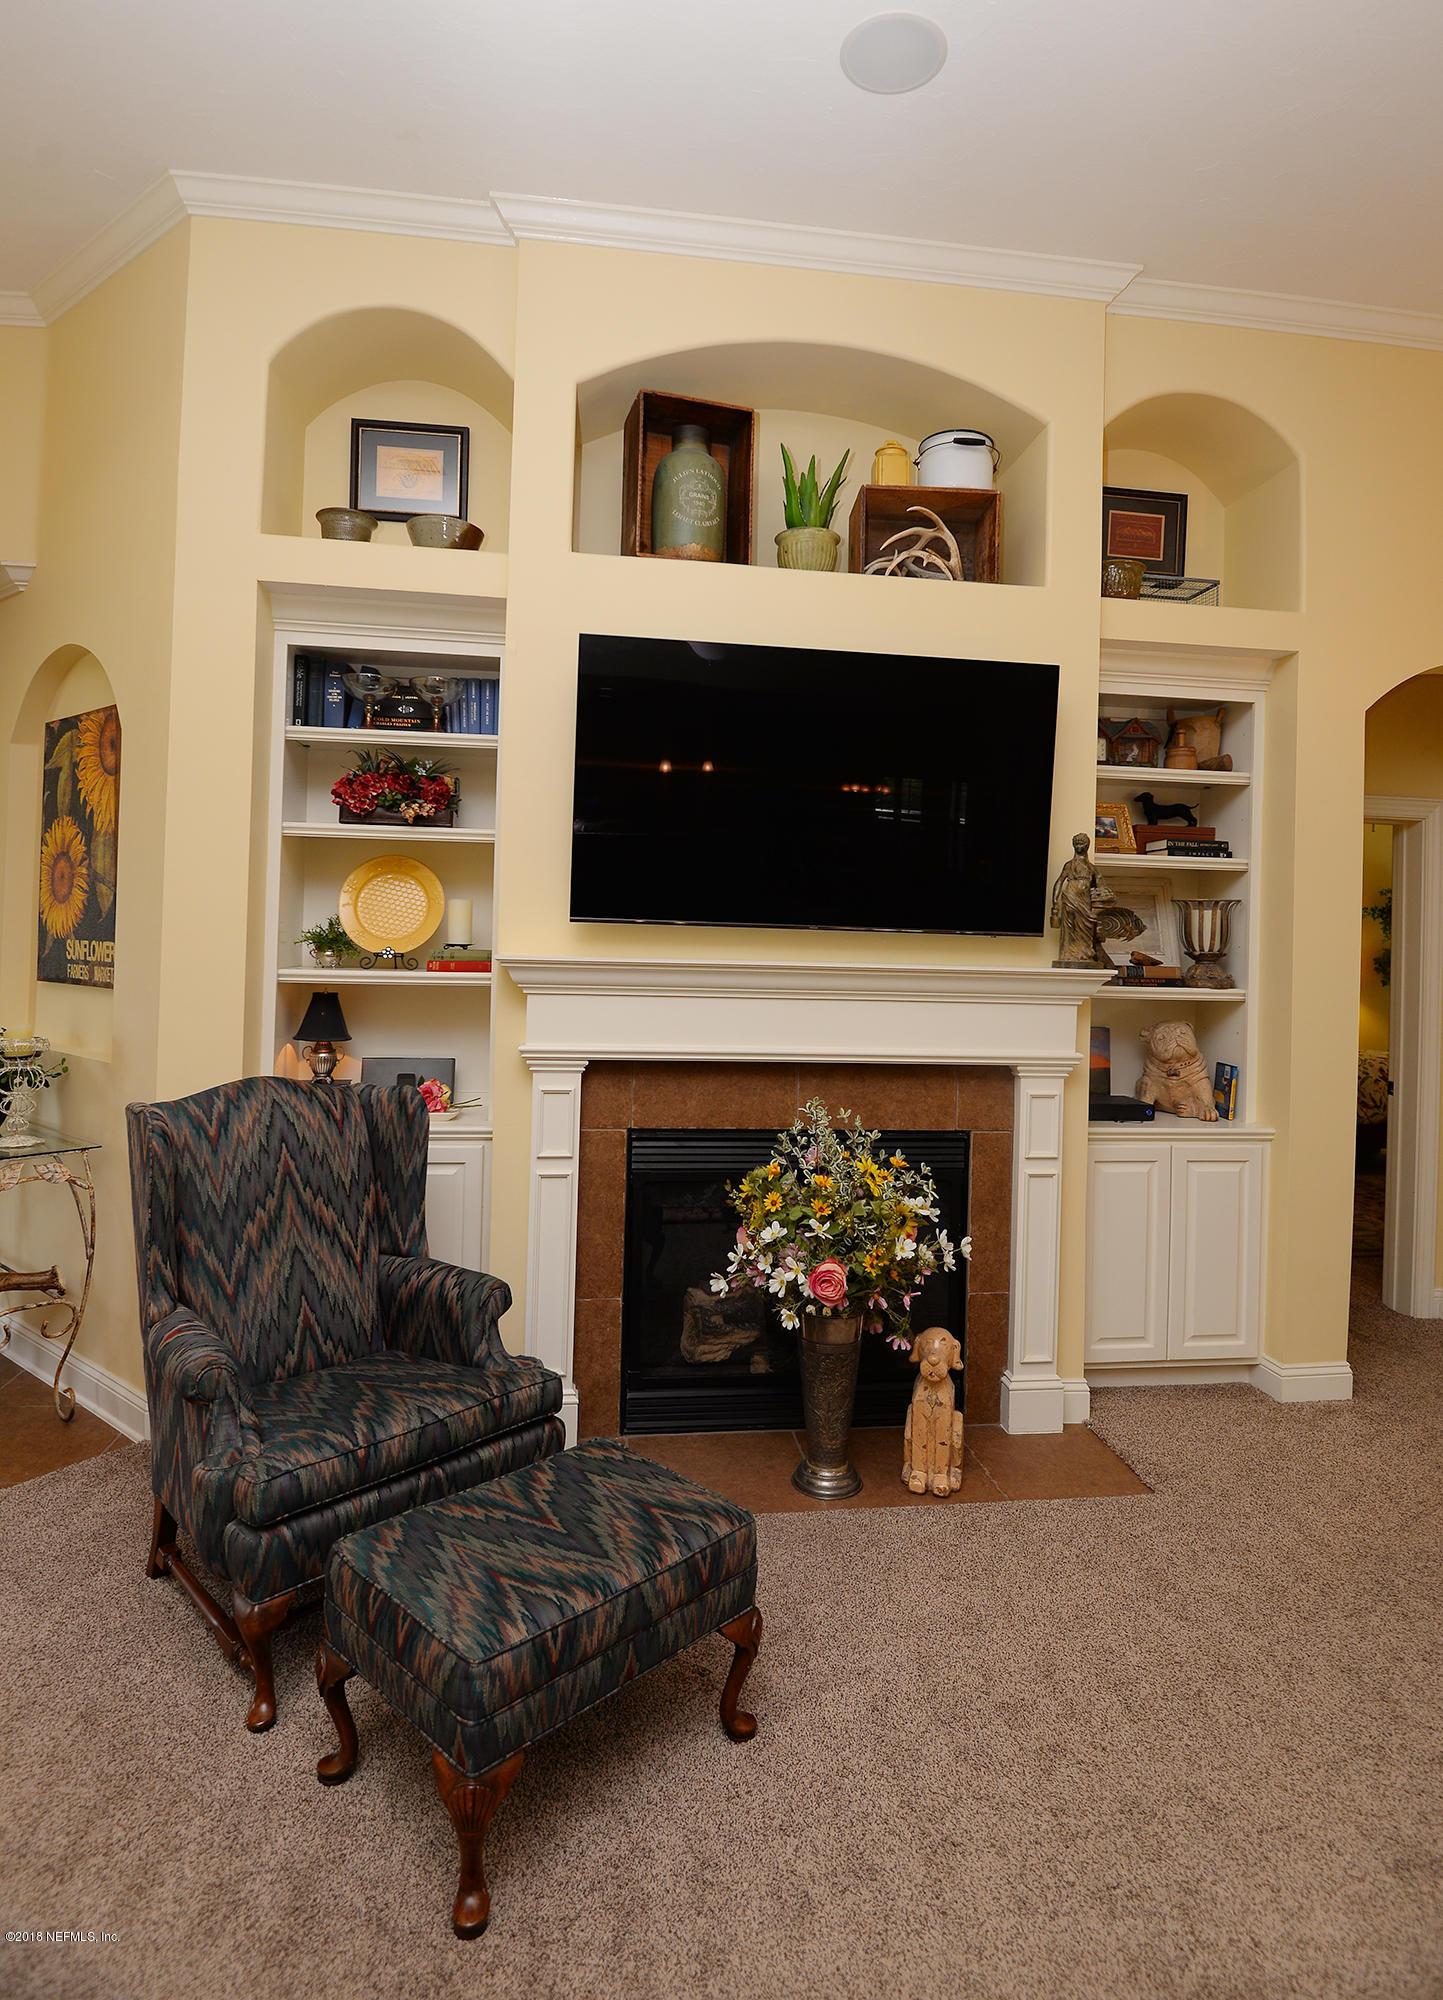 1100 DANDRIDGE, ST JOHNS, FLORIDA 32259, 5 Bedrooms Bedrooms, ,3 BathroomsBathrooms,Residential - single family,For sale,DANDRIDGE,949094